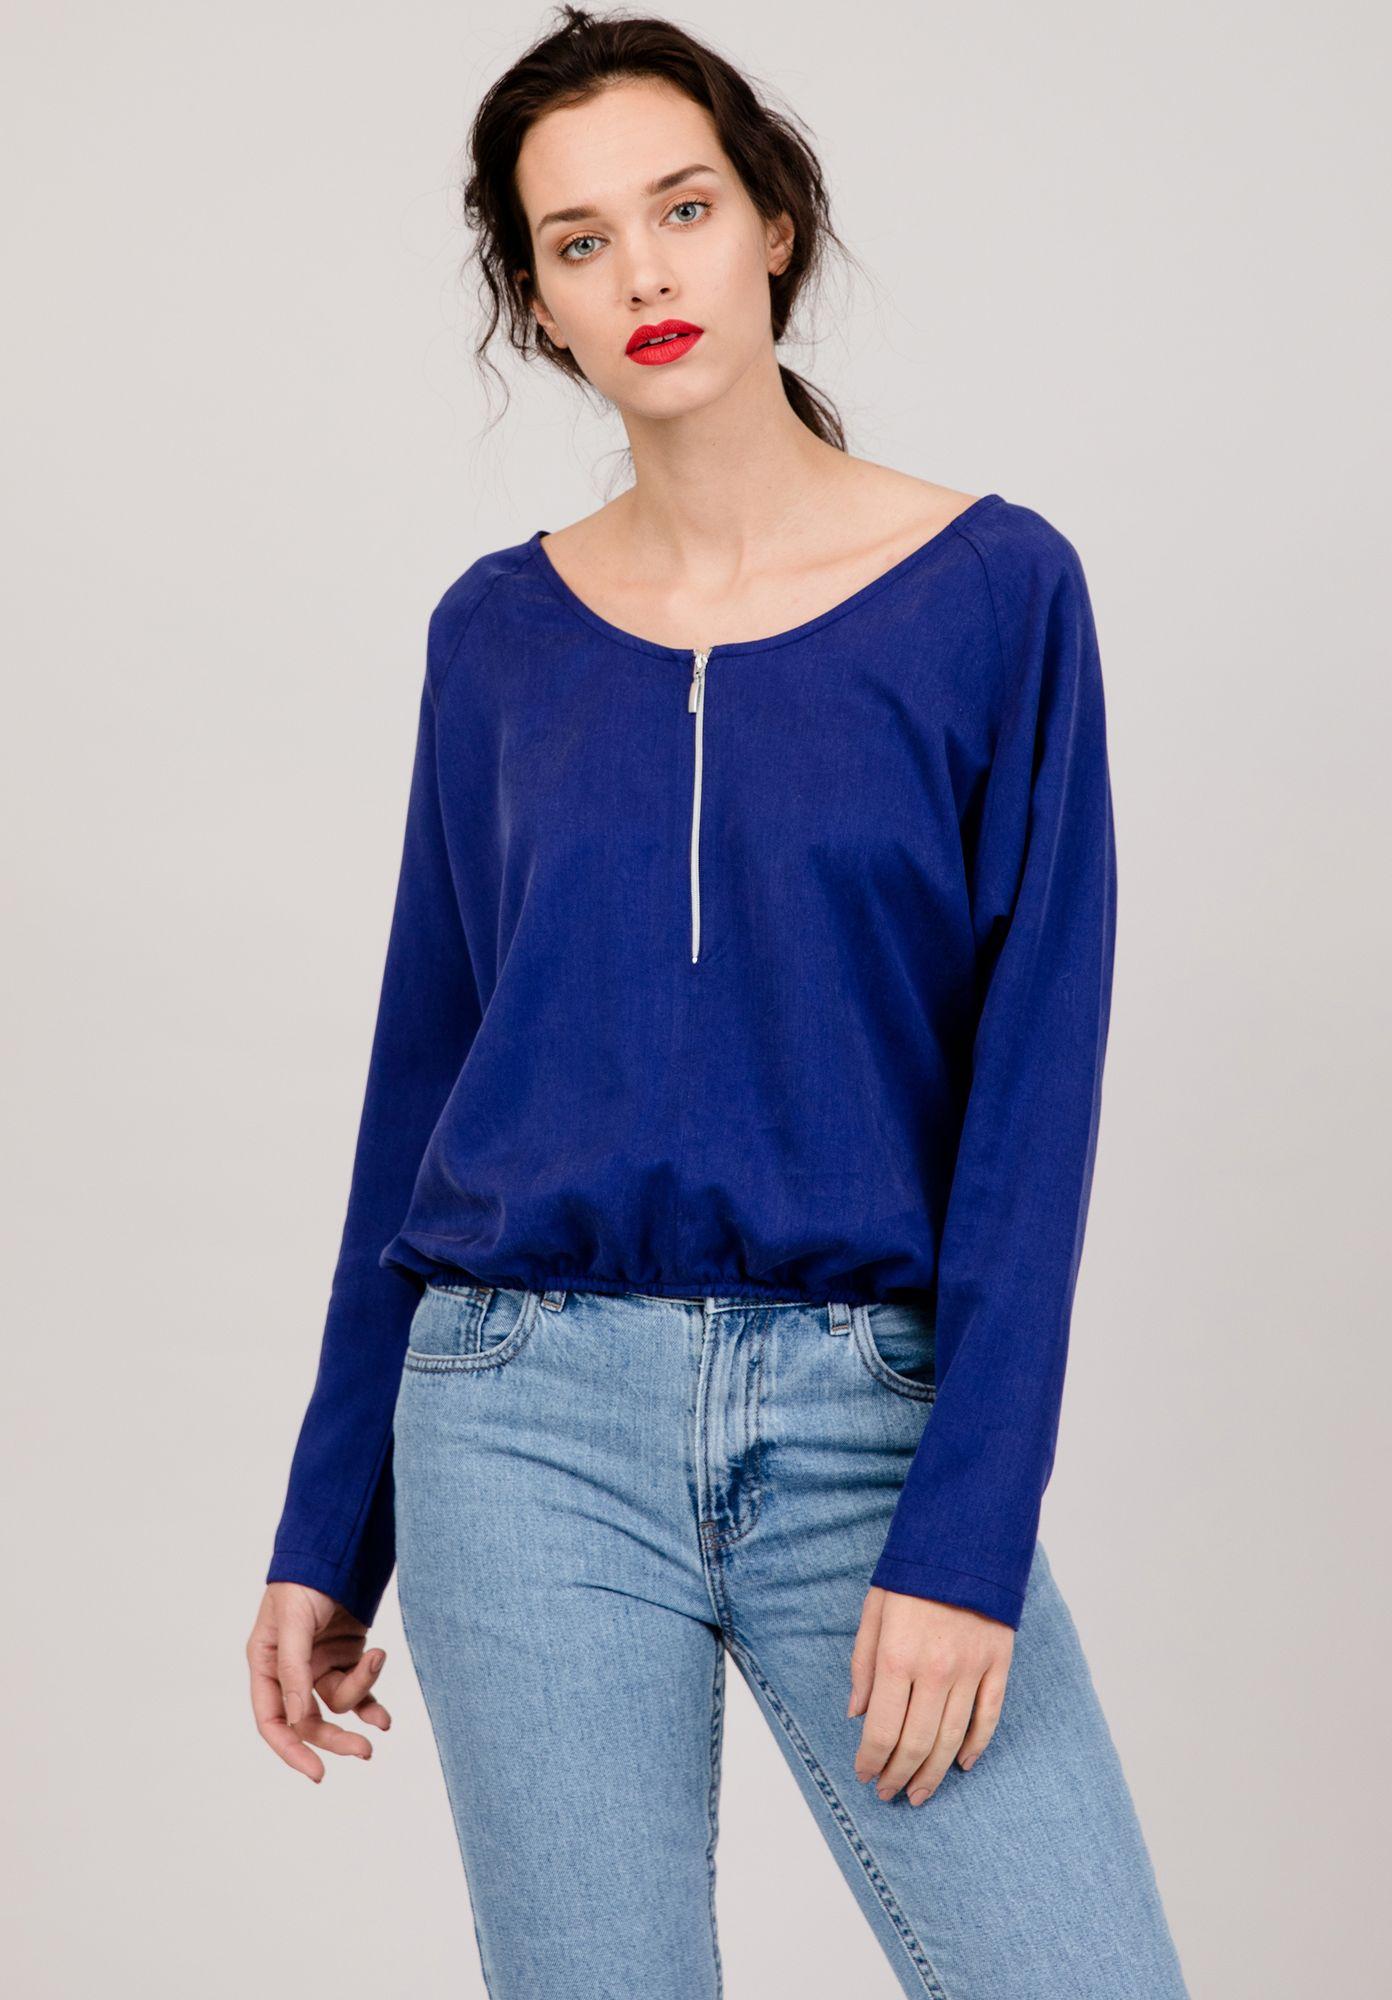 LOVJOI Damen Bluse PONDWEED Blau Nachhaltig Fair